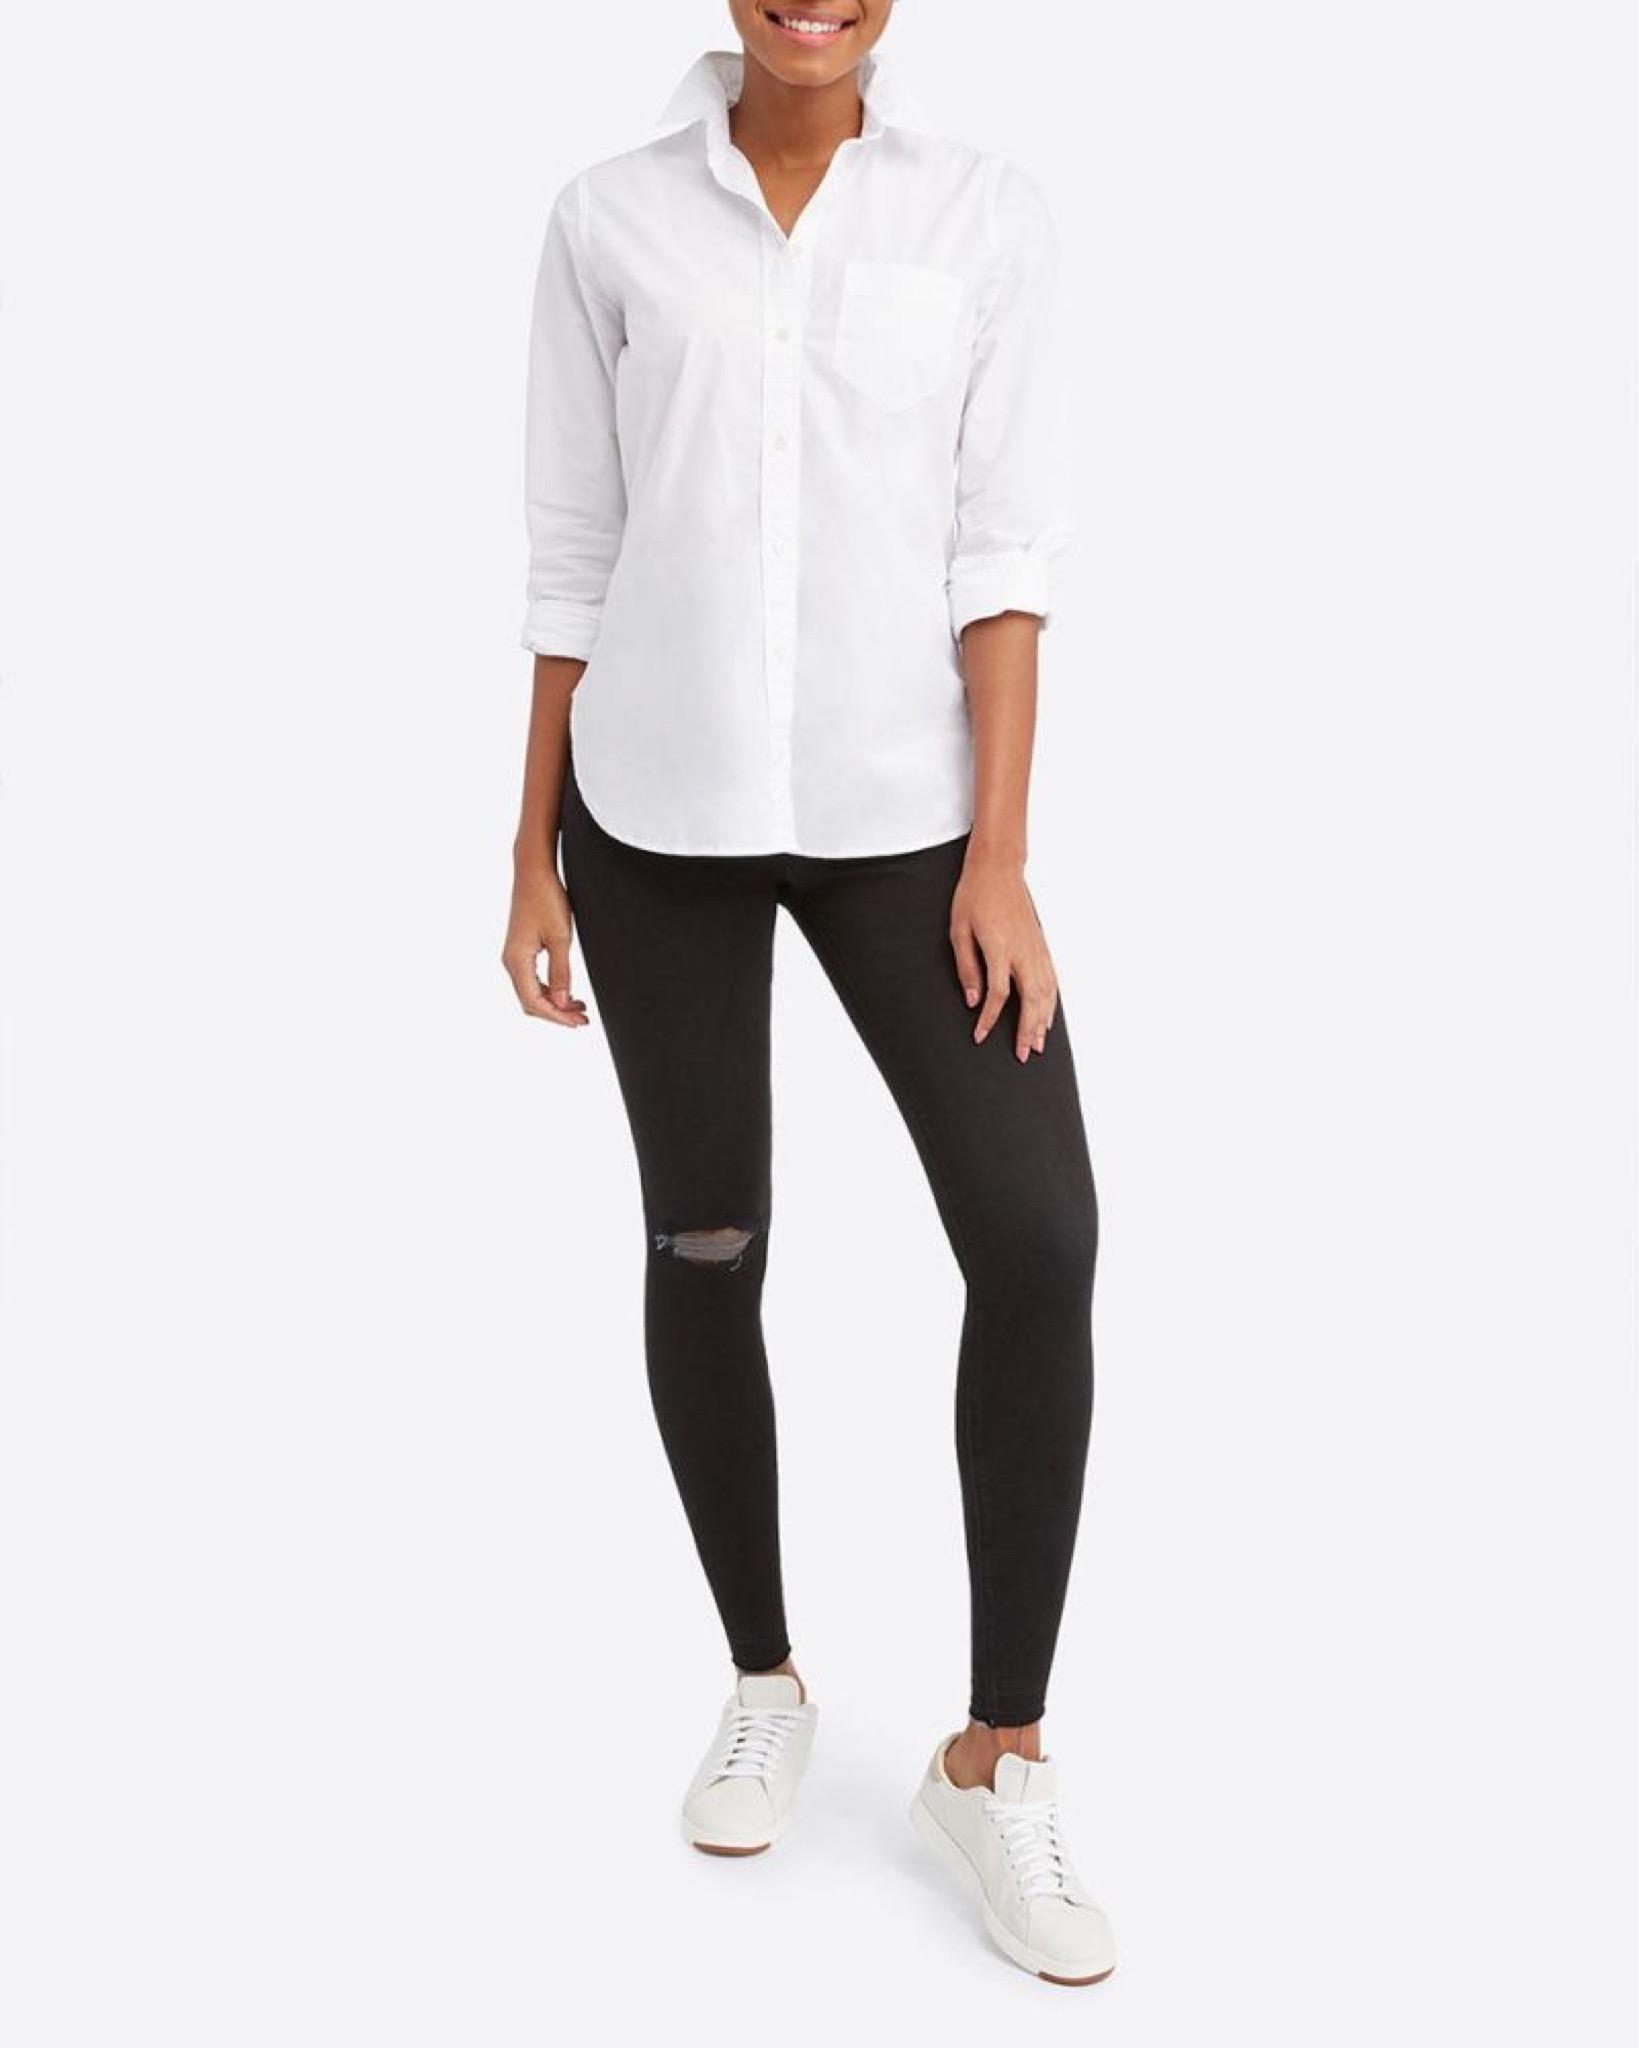 Spanx End of Season Sale, Vintage Distressed Ankle Skinny Jeans